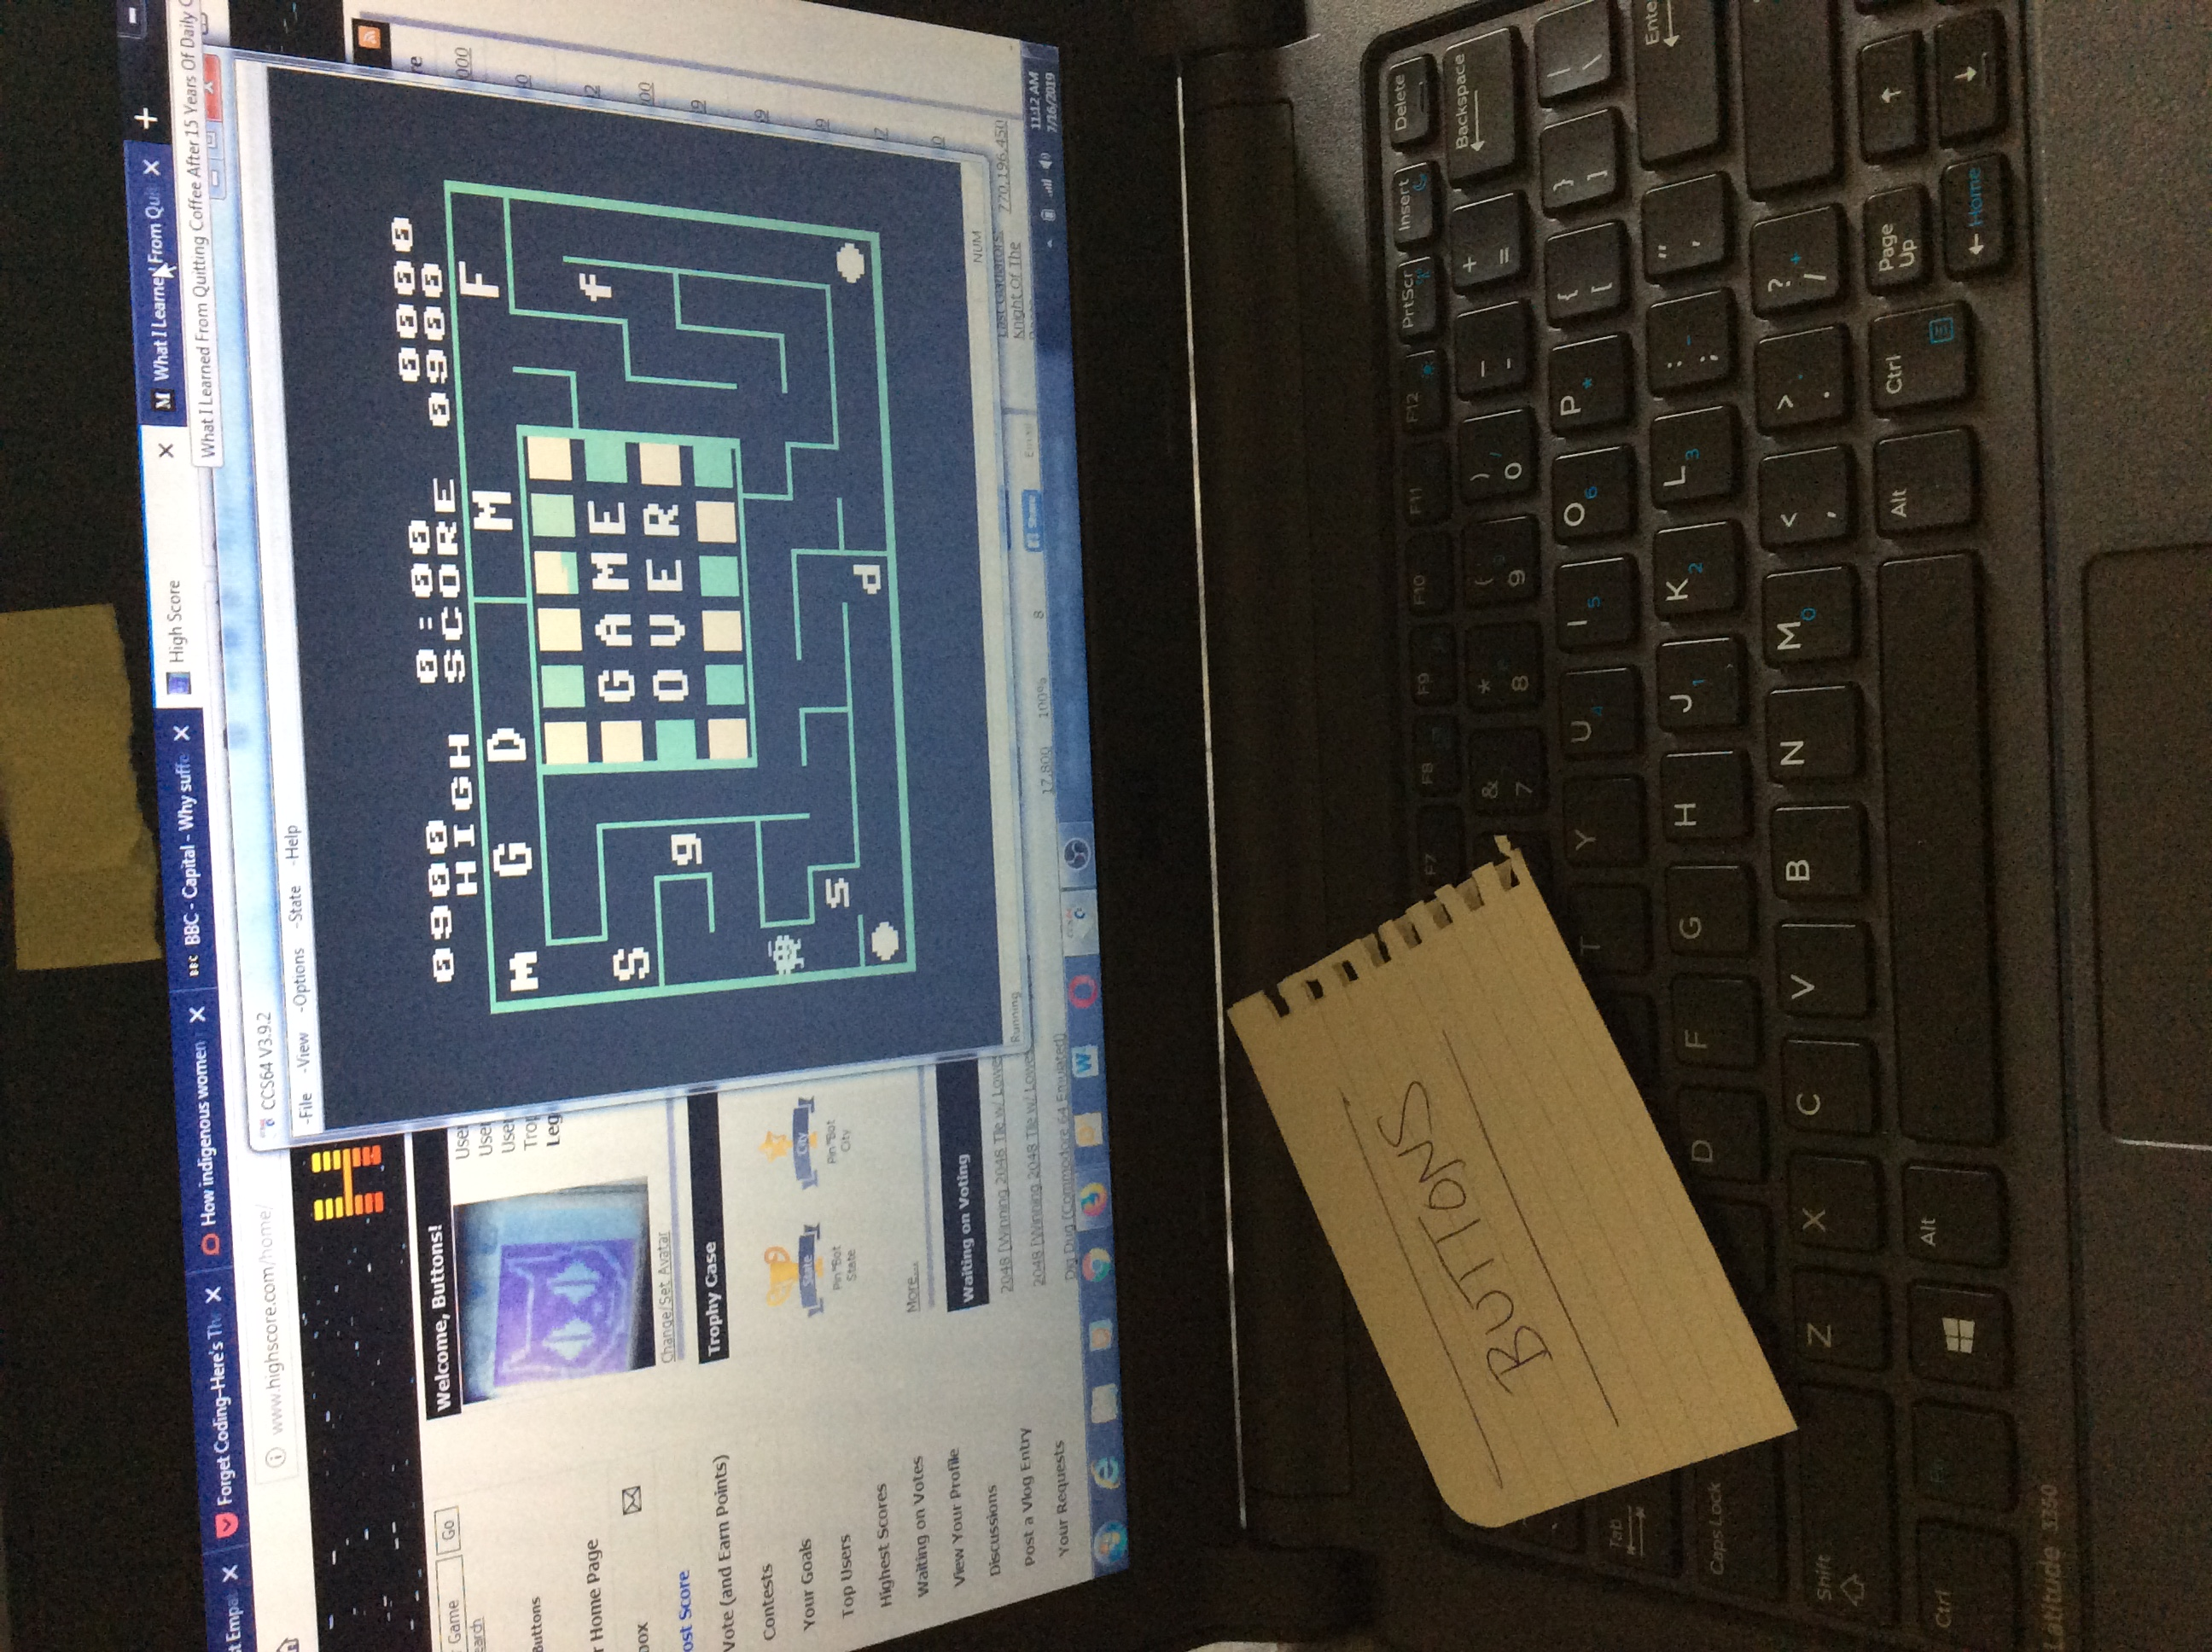 Alphabet Zoo [Level 1 / Game 1 / Mixed] 900 points